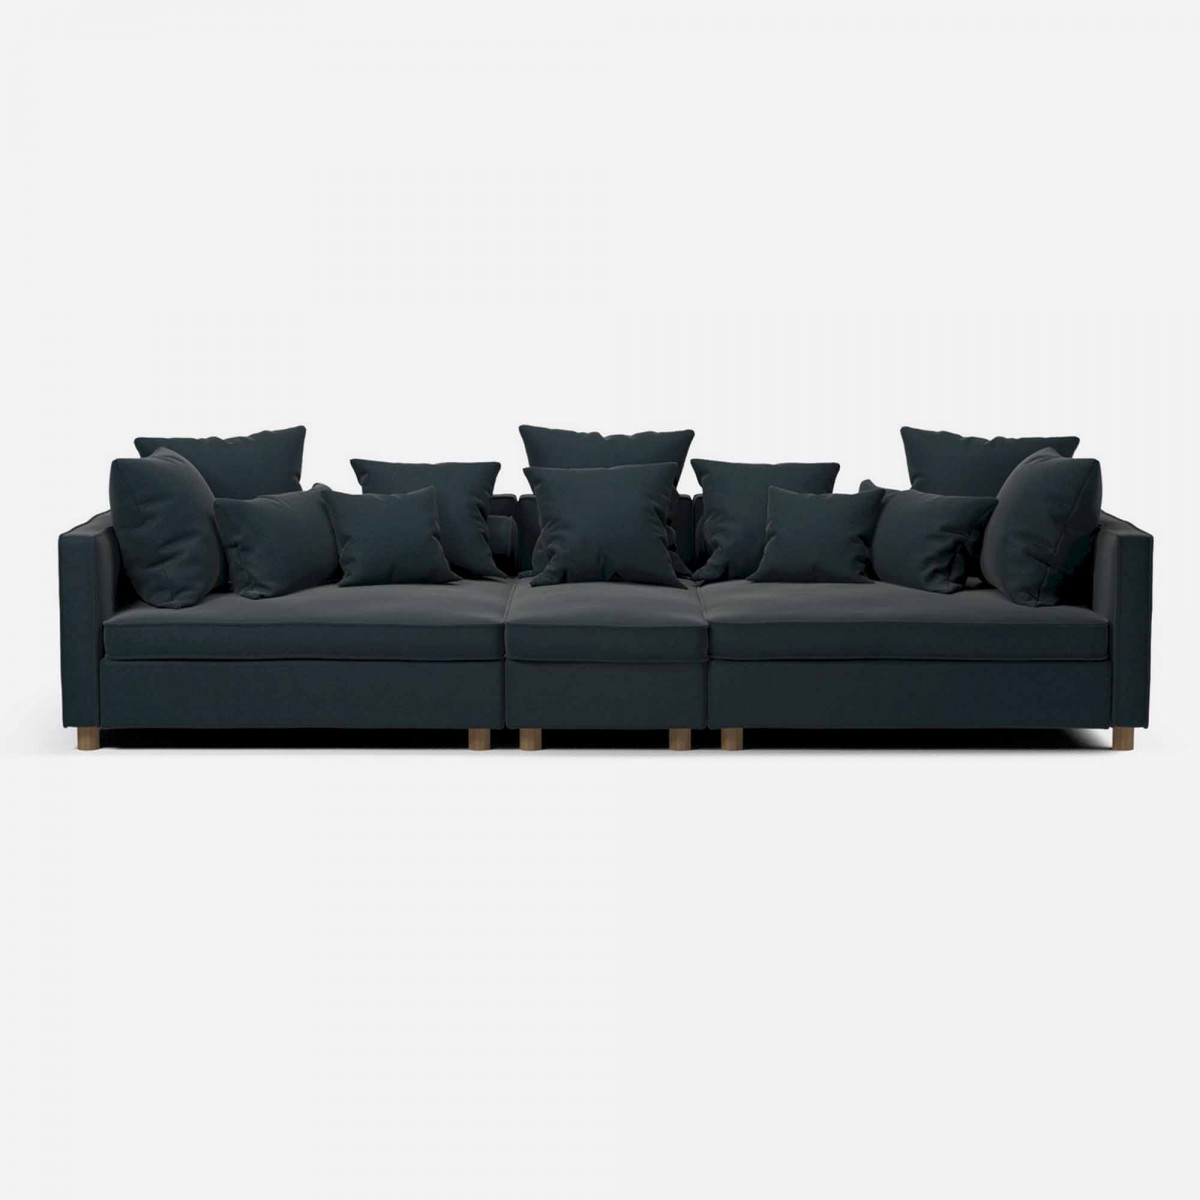 Mr BIG sofa 3 units S BOLIA